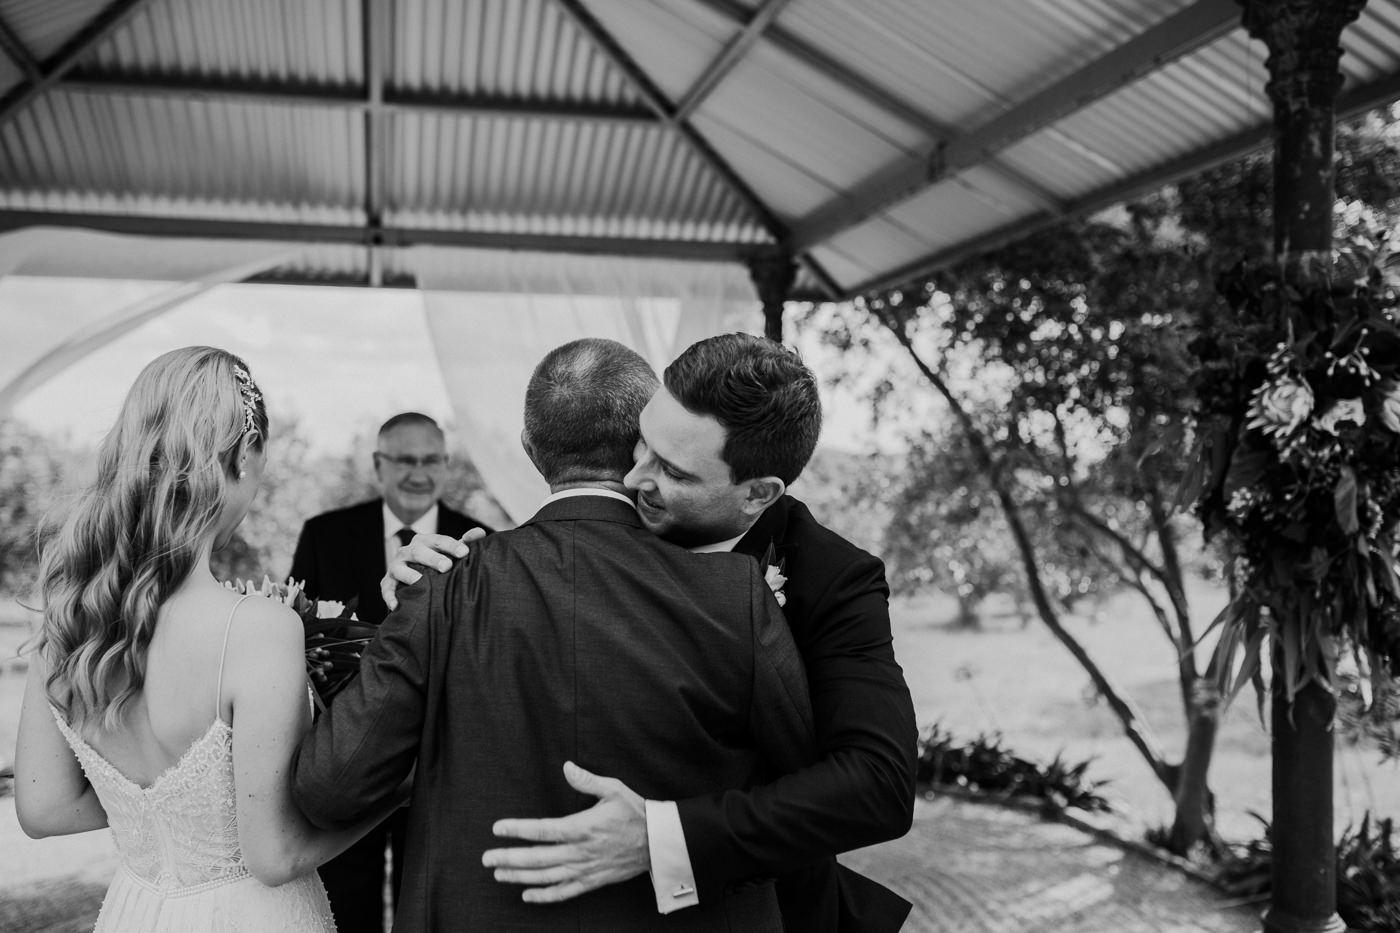 Anthony & Eliet - Wagga Wagga Wedding - Country NSW - Samantha Heather Photography-98.jpg